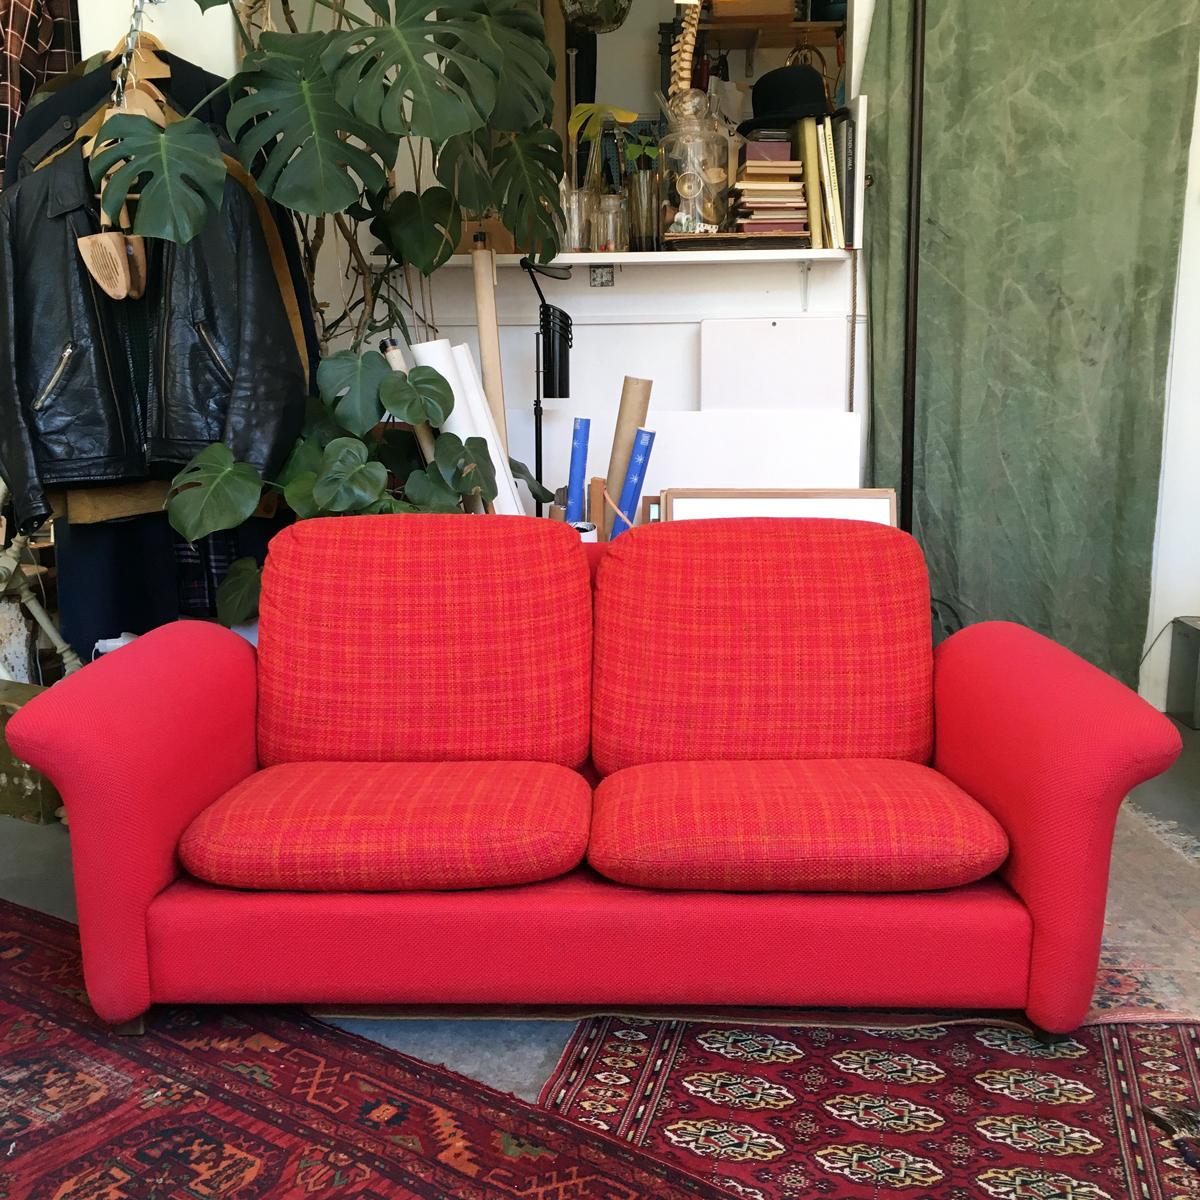 FABRIKEN_soffa_2sits_1